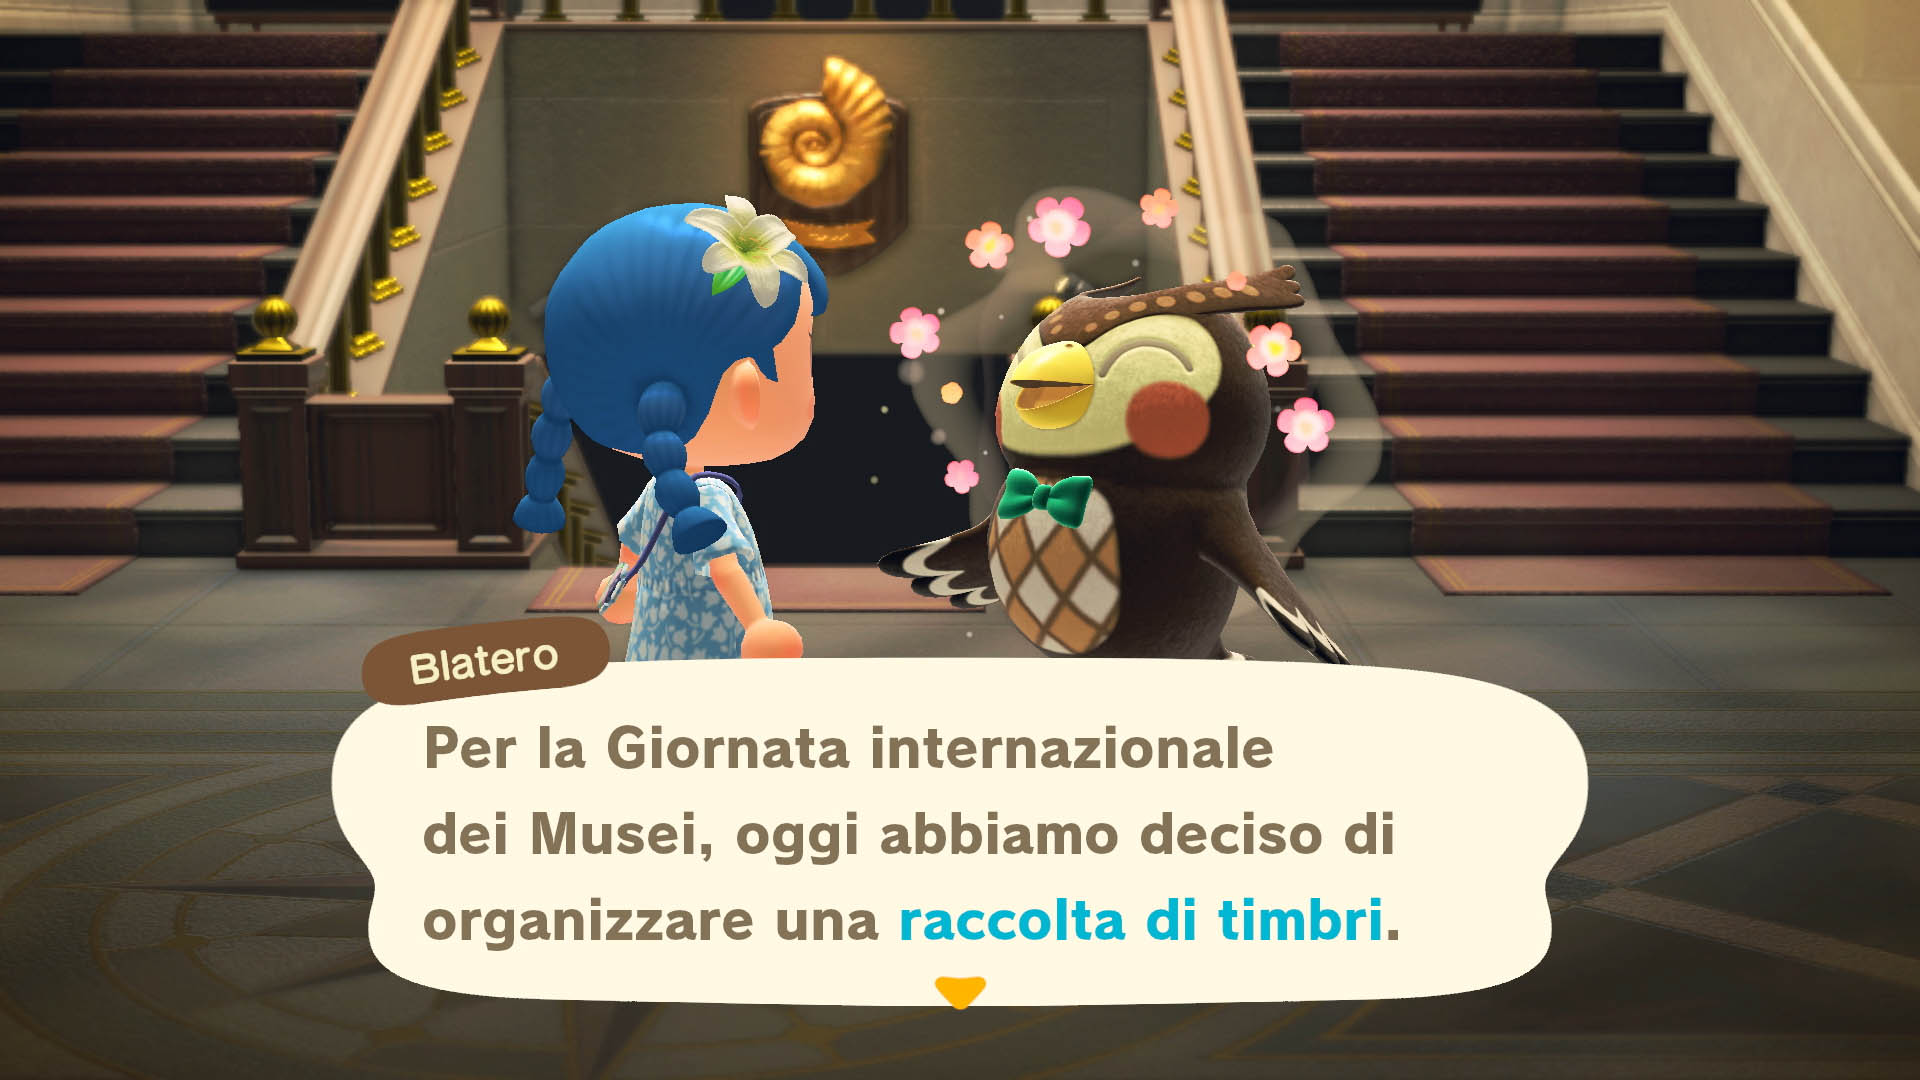 Animal Crossing: New Horizons Aggiornamento 23/4/20 Cover